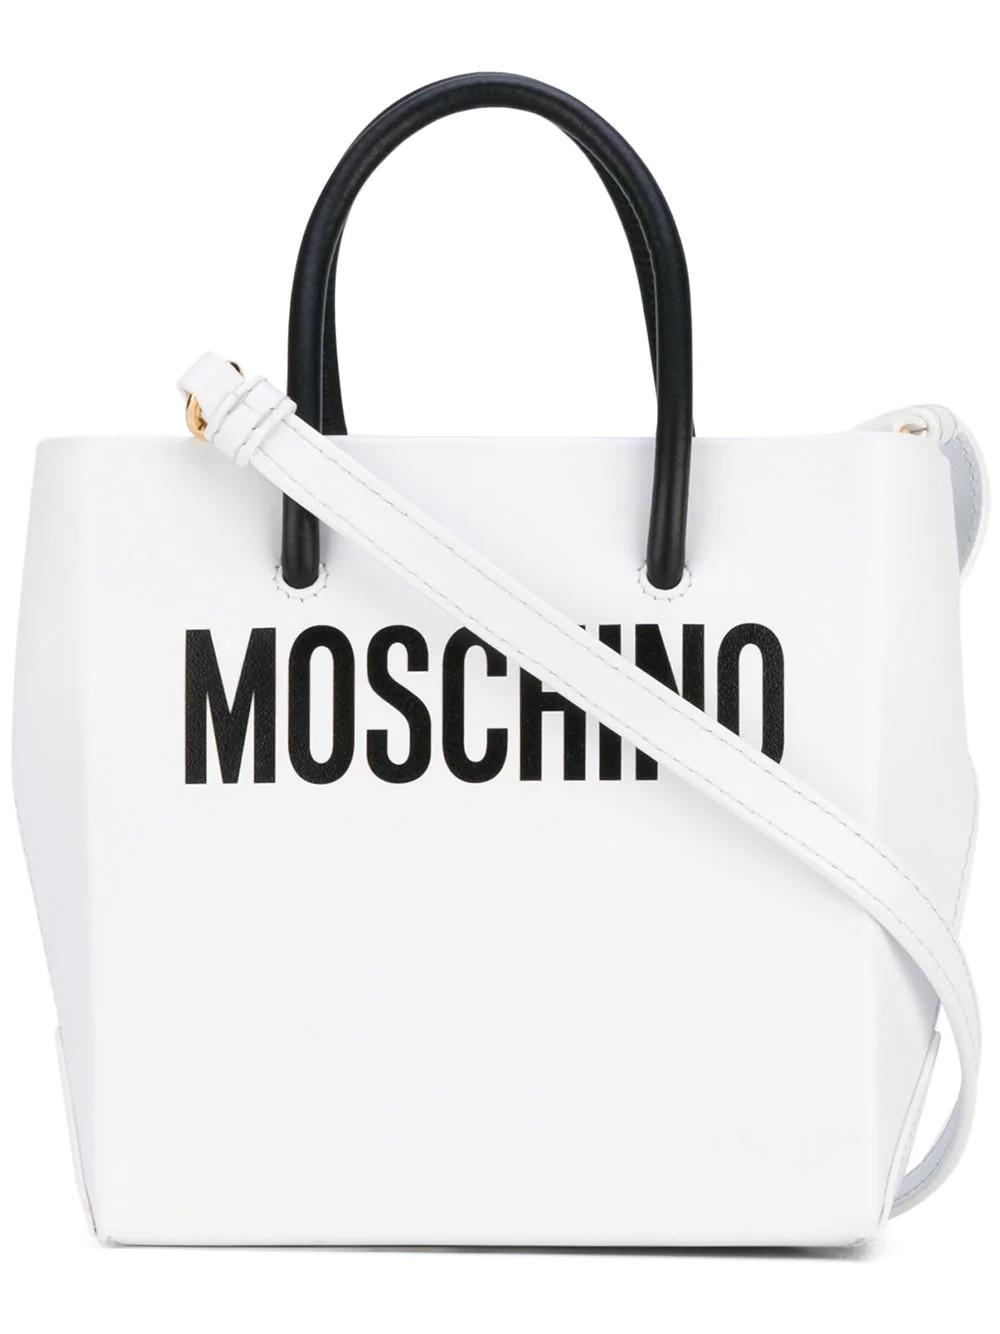 MOSCHINO | миниатюрная сумка-шоппер через плечо | Clouty